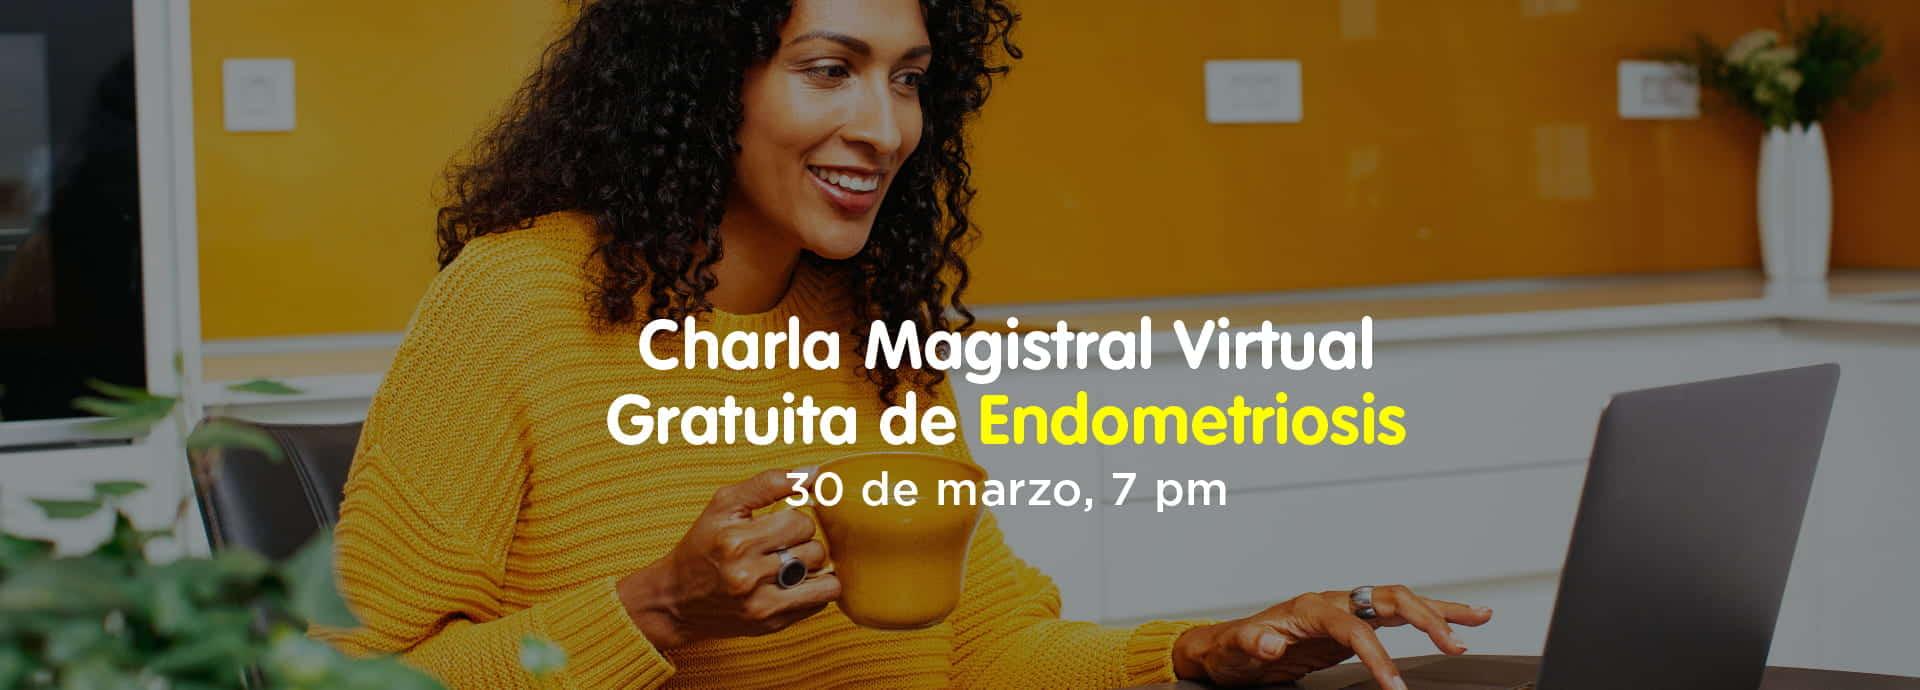 Charla Magistral Endometriosis